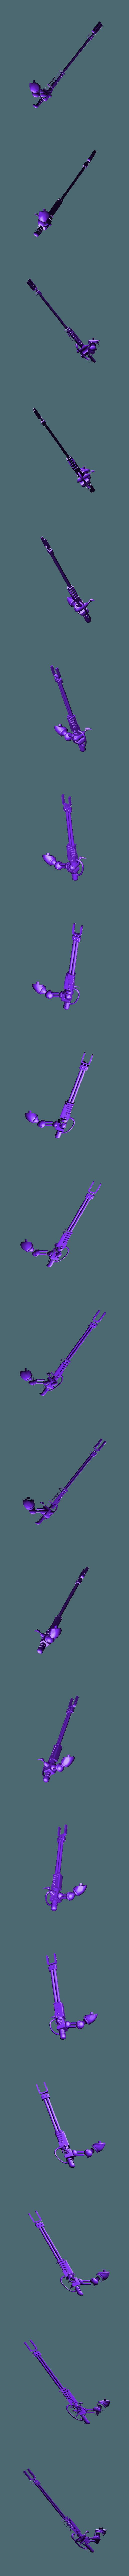 Princeps_rightarm_Taser.stl Download free STL file Martian Leader of Stealthy Intruders • 3D printing template, ErikTheHeretek